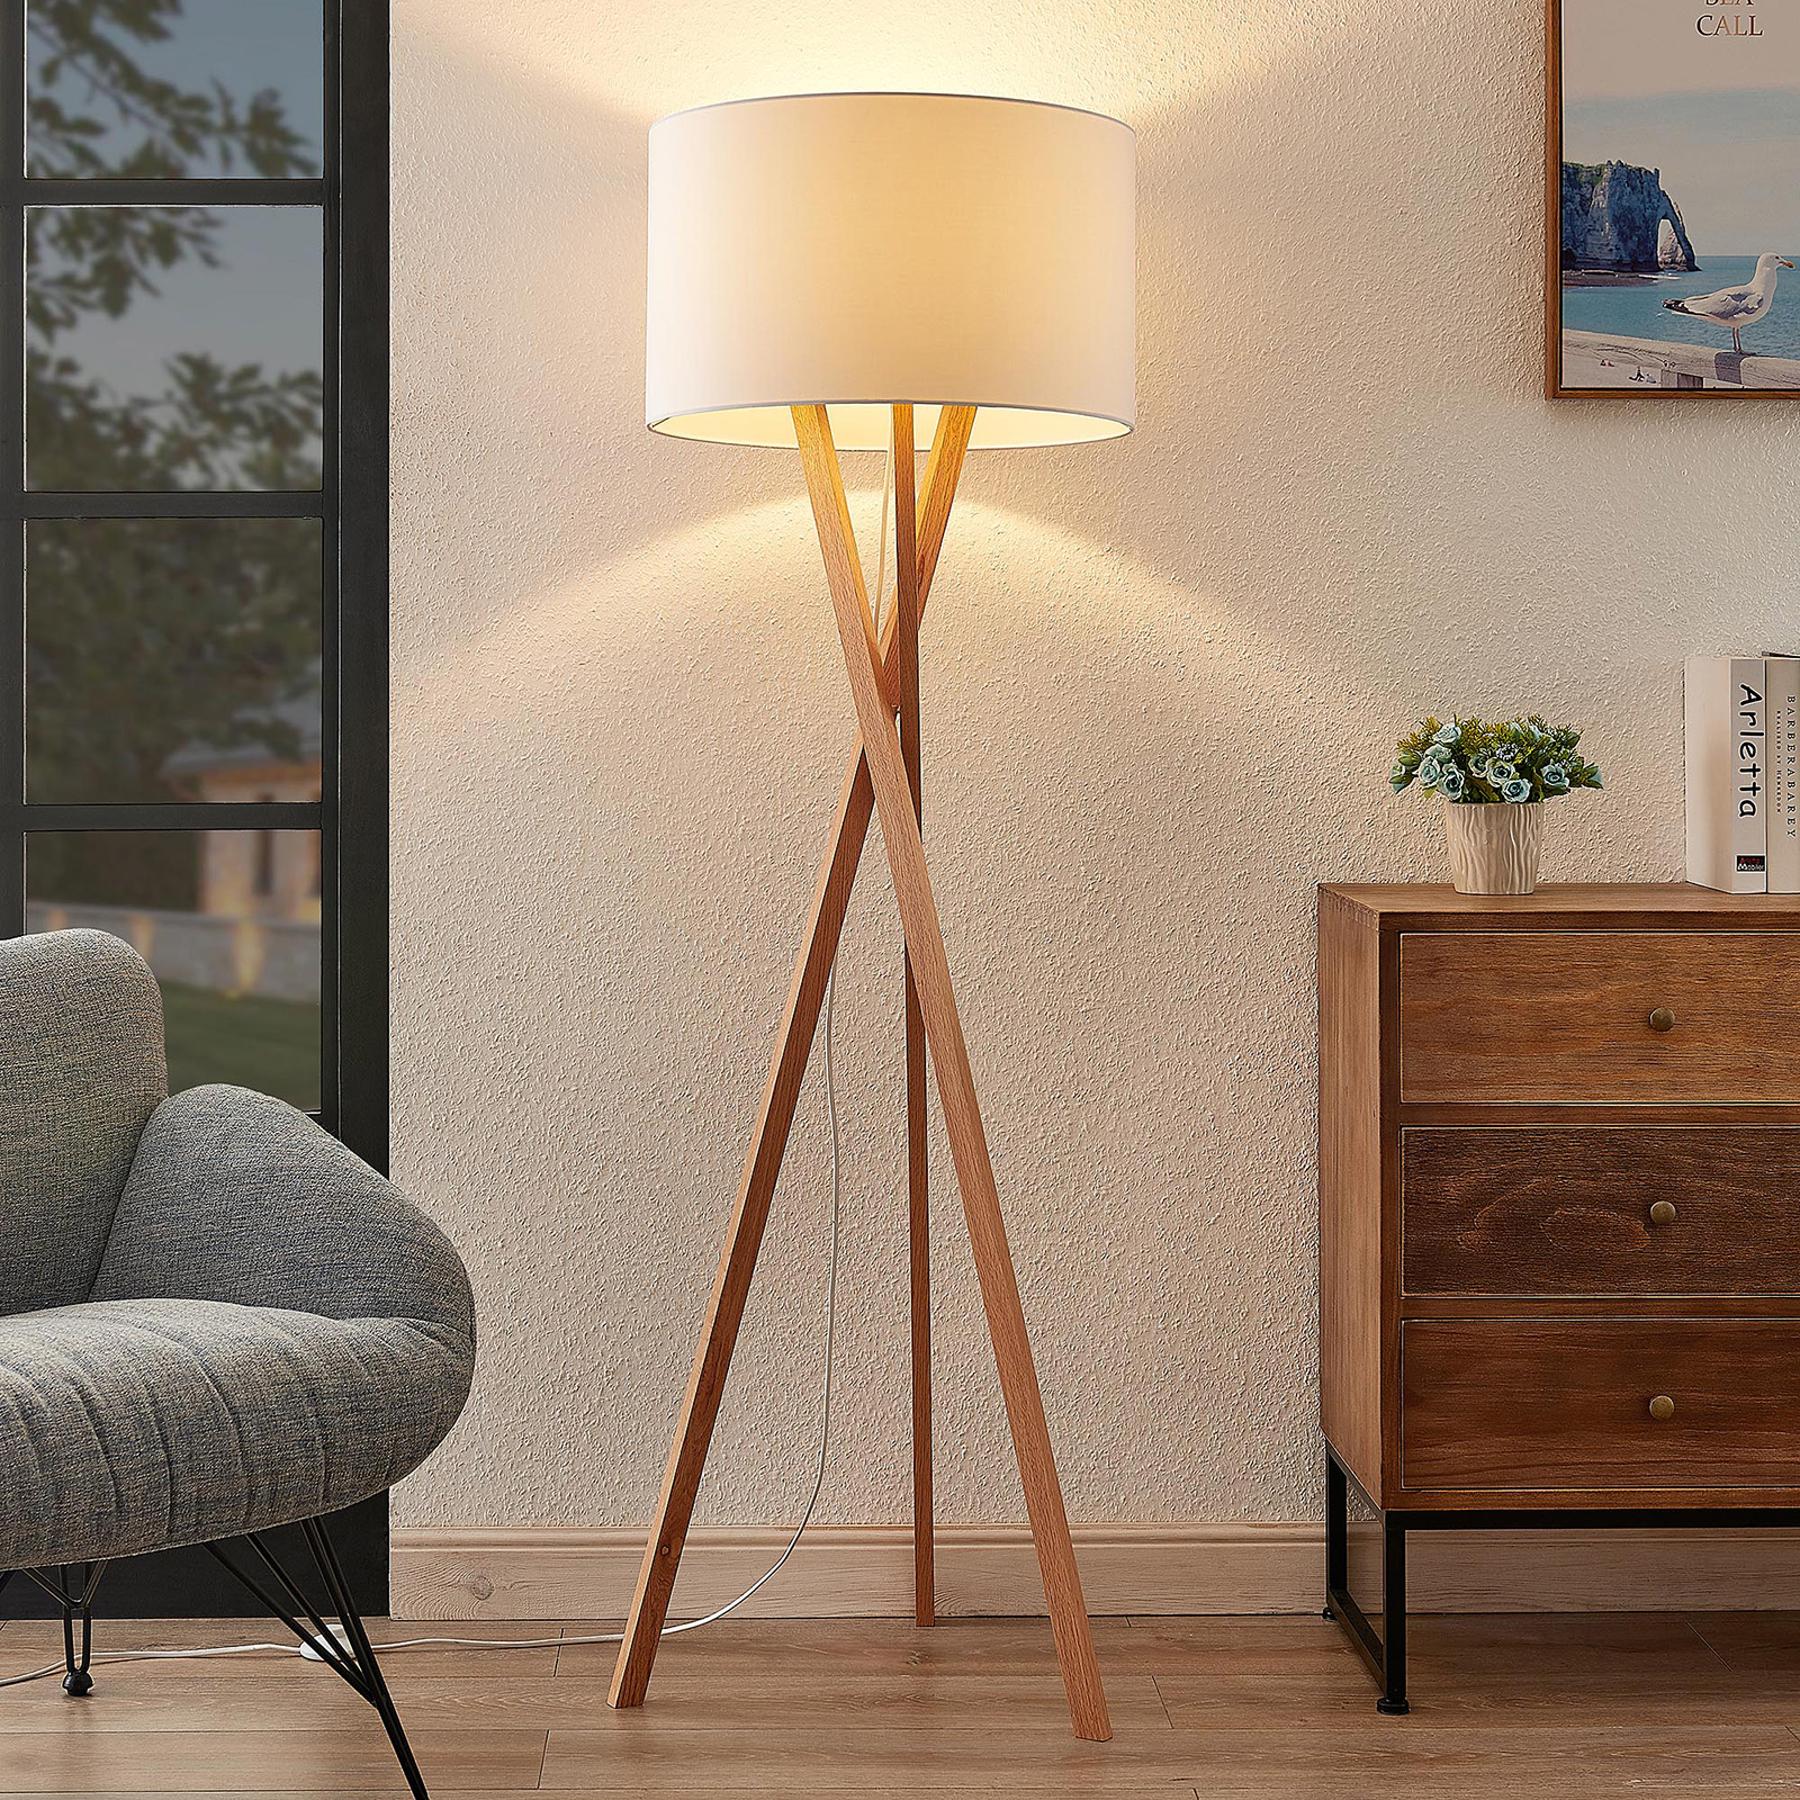 Lucande Auriane tripod-vloerlamp, stof wit